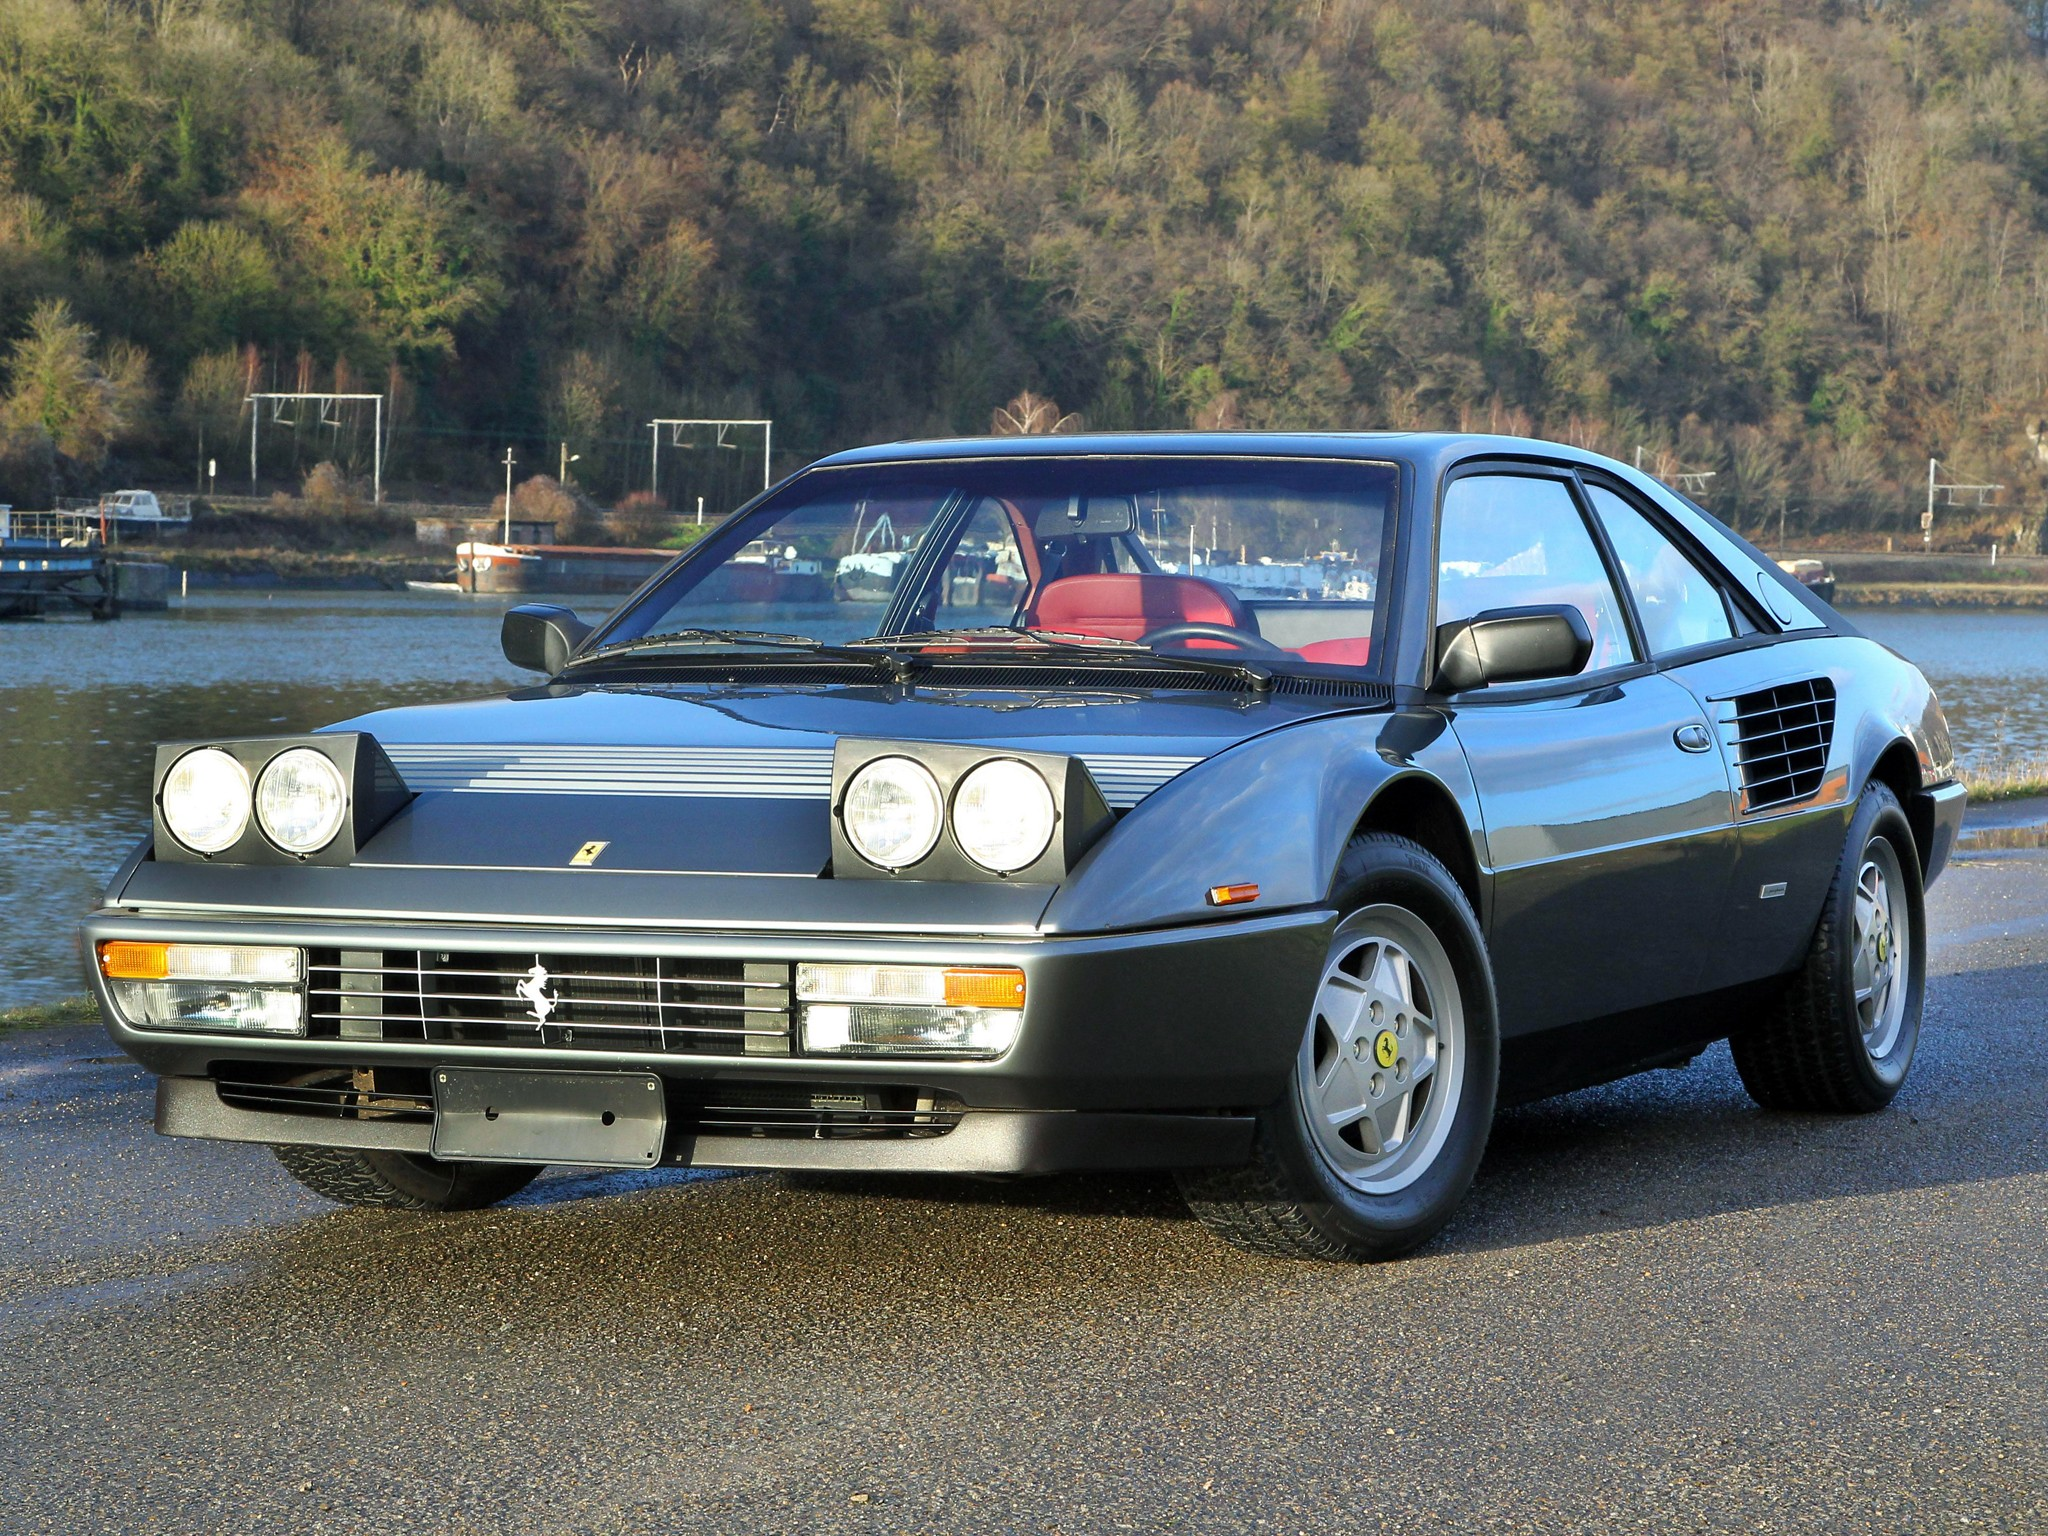 FERRARI-Mondial-3-2-5511_14 Gorgeous Ferrari Mondial 3.2 Cabriolet V8 Quattrovalvole Cars Trend